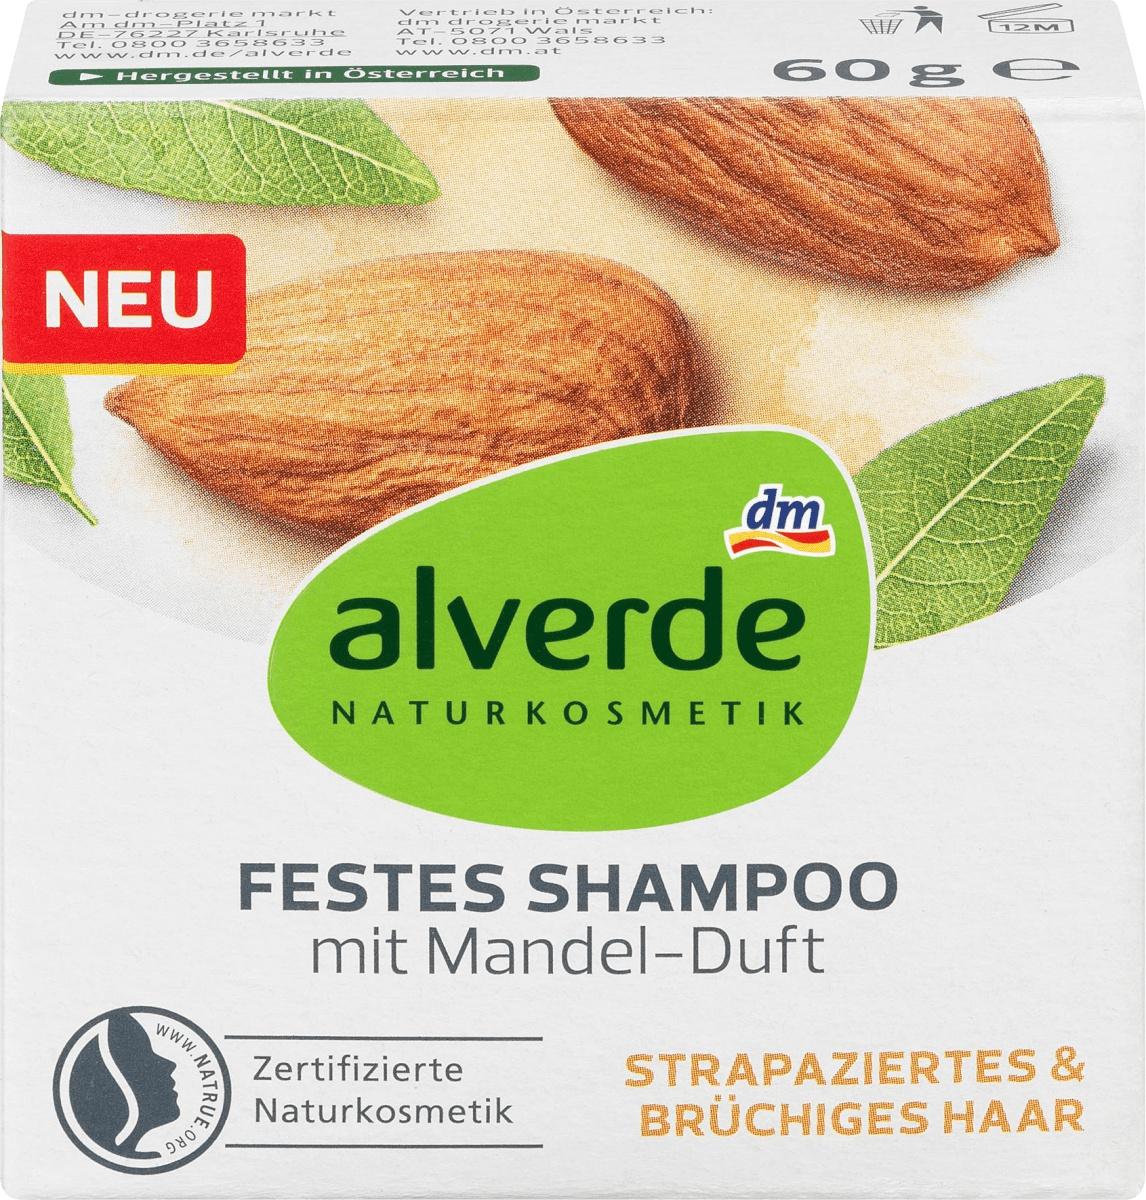 Alverde Naturkosmetik Festes Shampoo